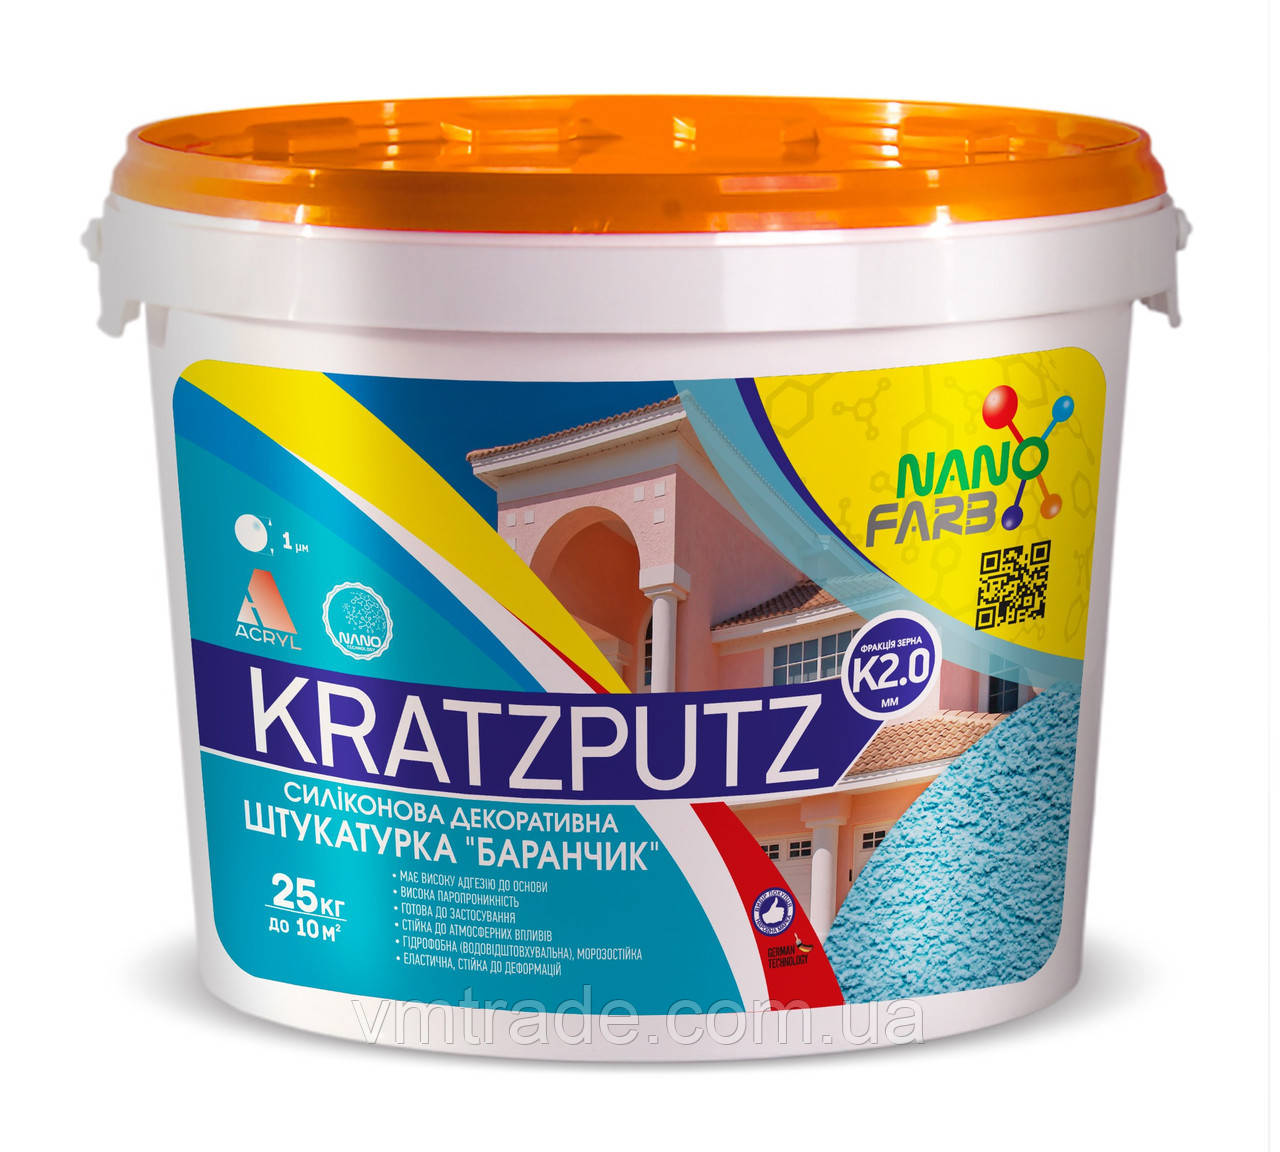 "Штукатурка силиконовая декоративная Kratzputz ""барашек"" K 2.0 НаноФарб (NanoFarb) 25 кг"